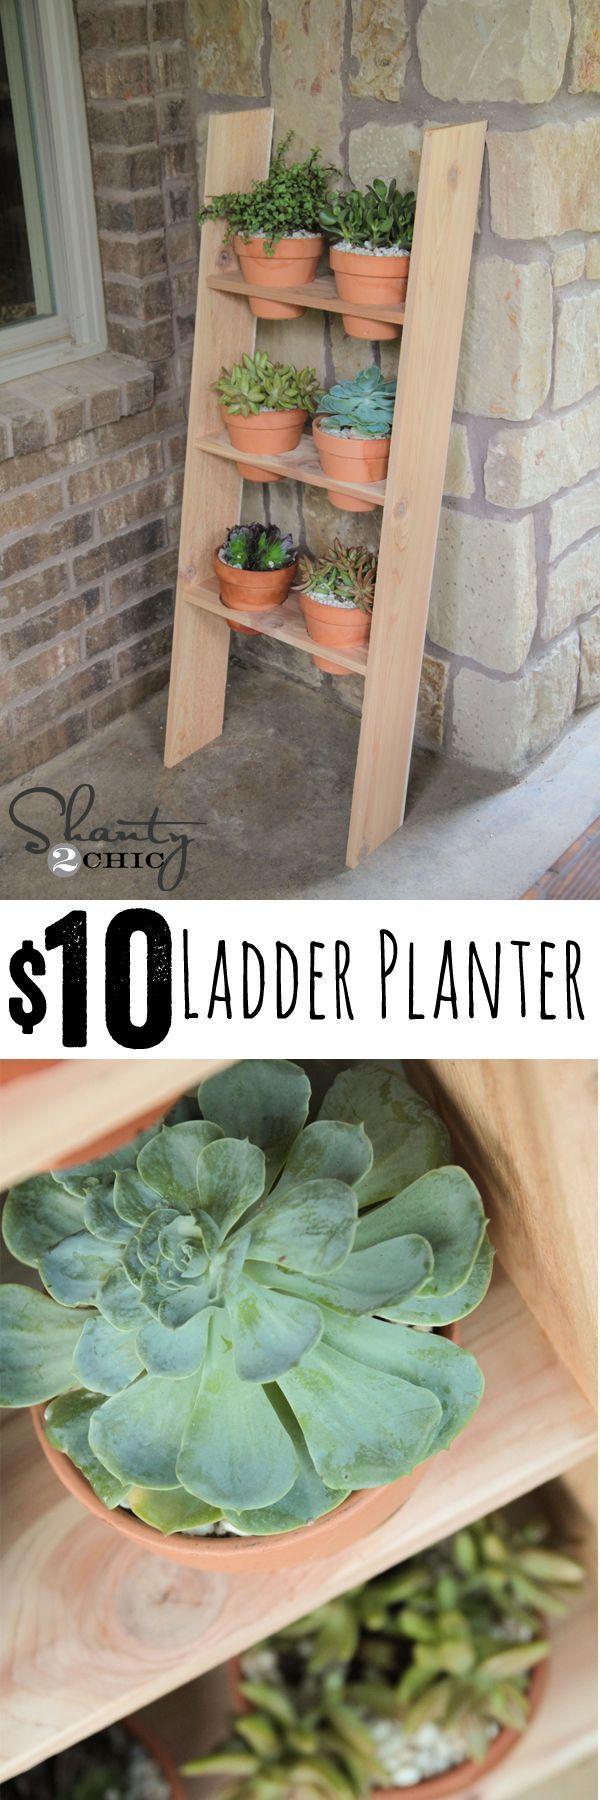 10 Ladder Planter Garden Projects Diy Ladder Planters 640 x 480